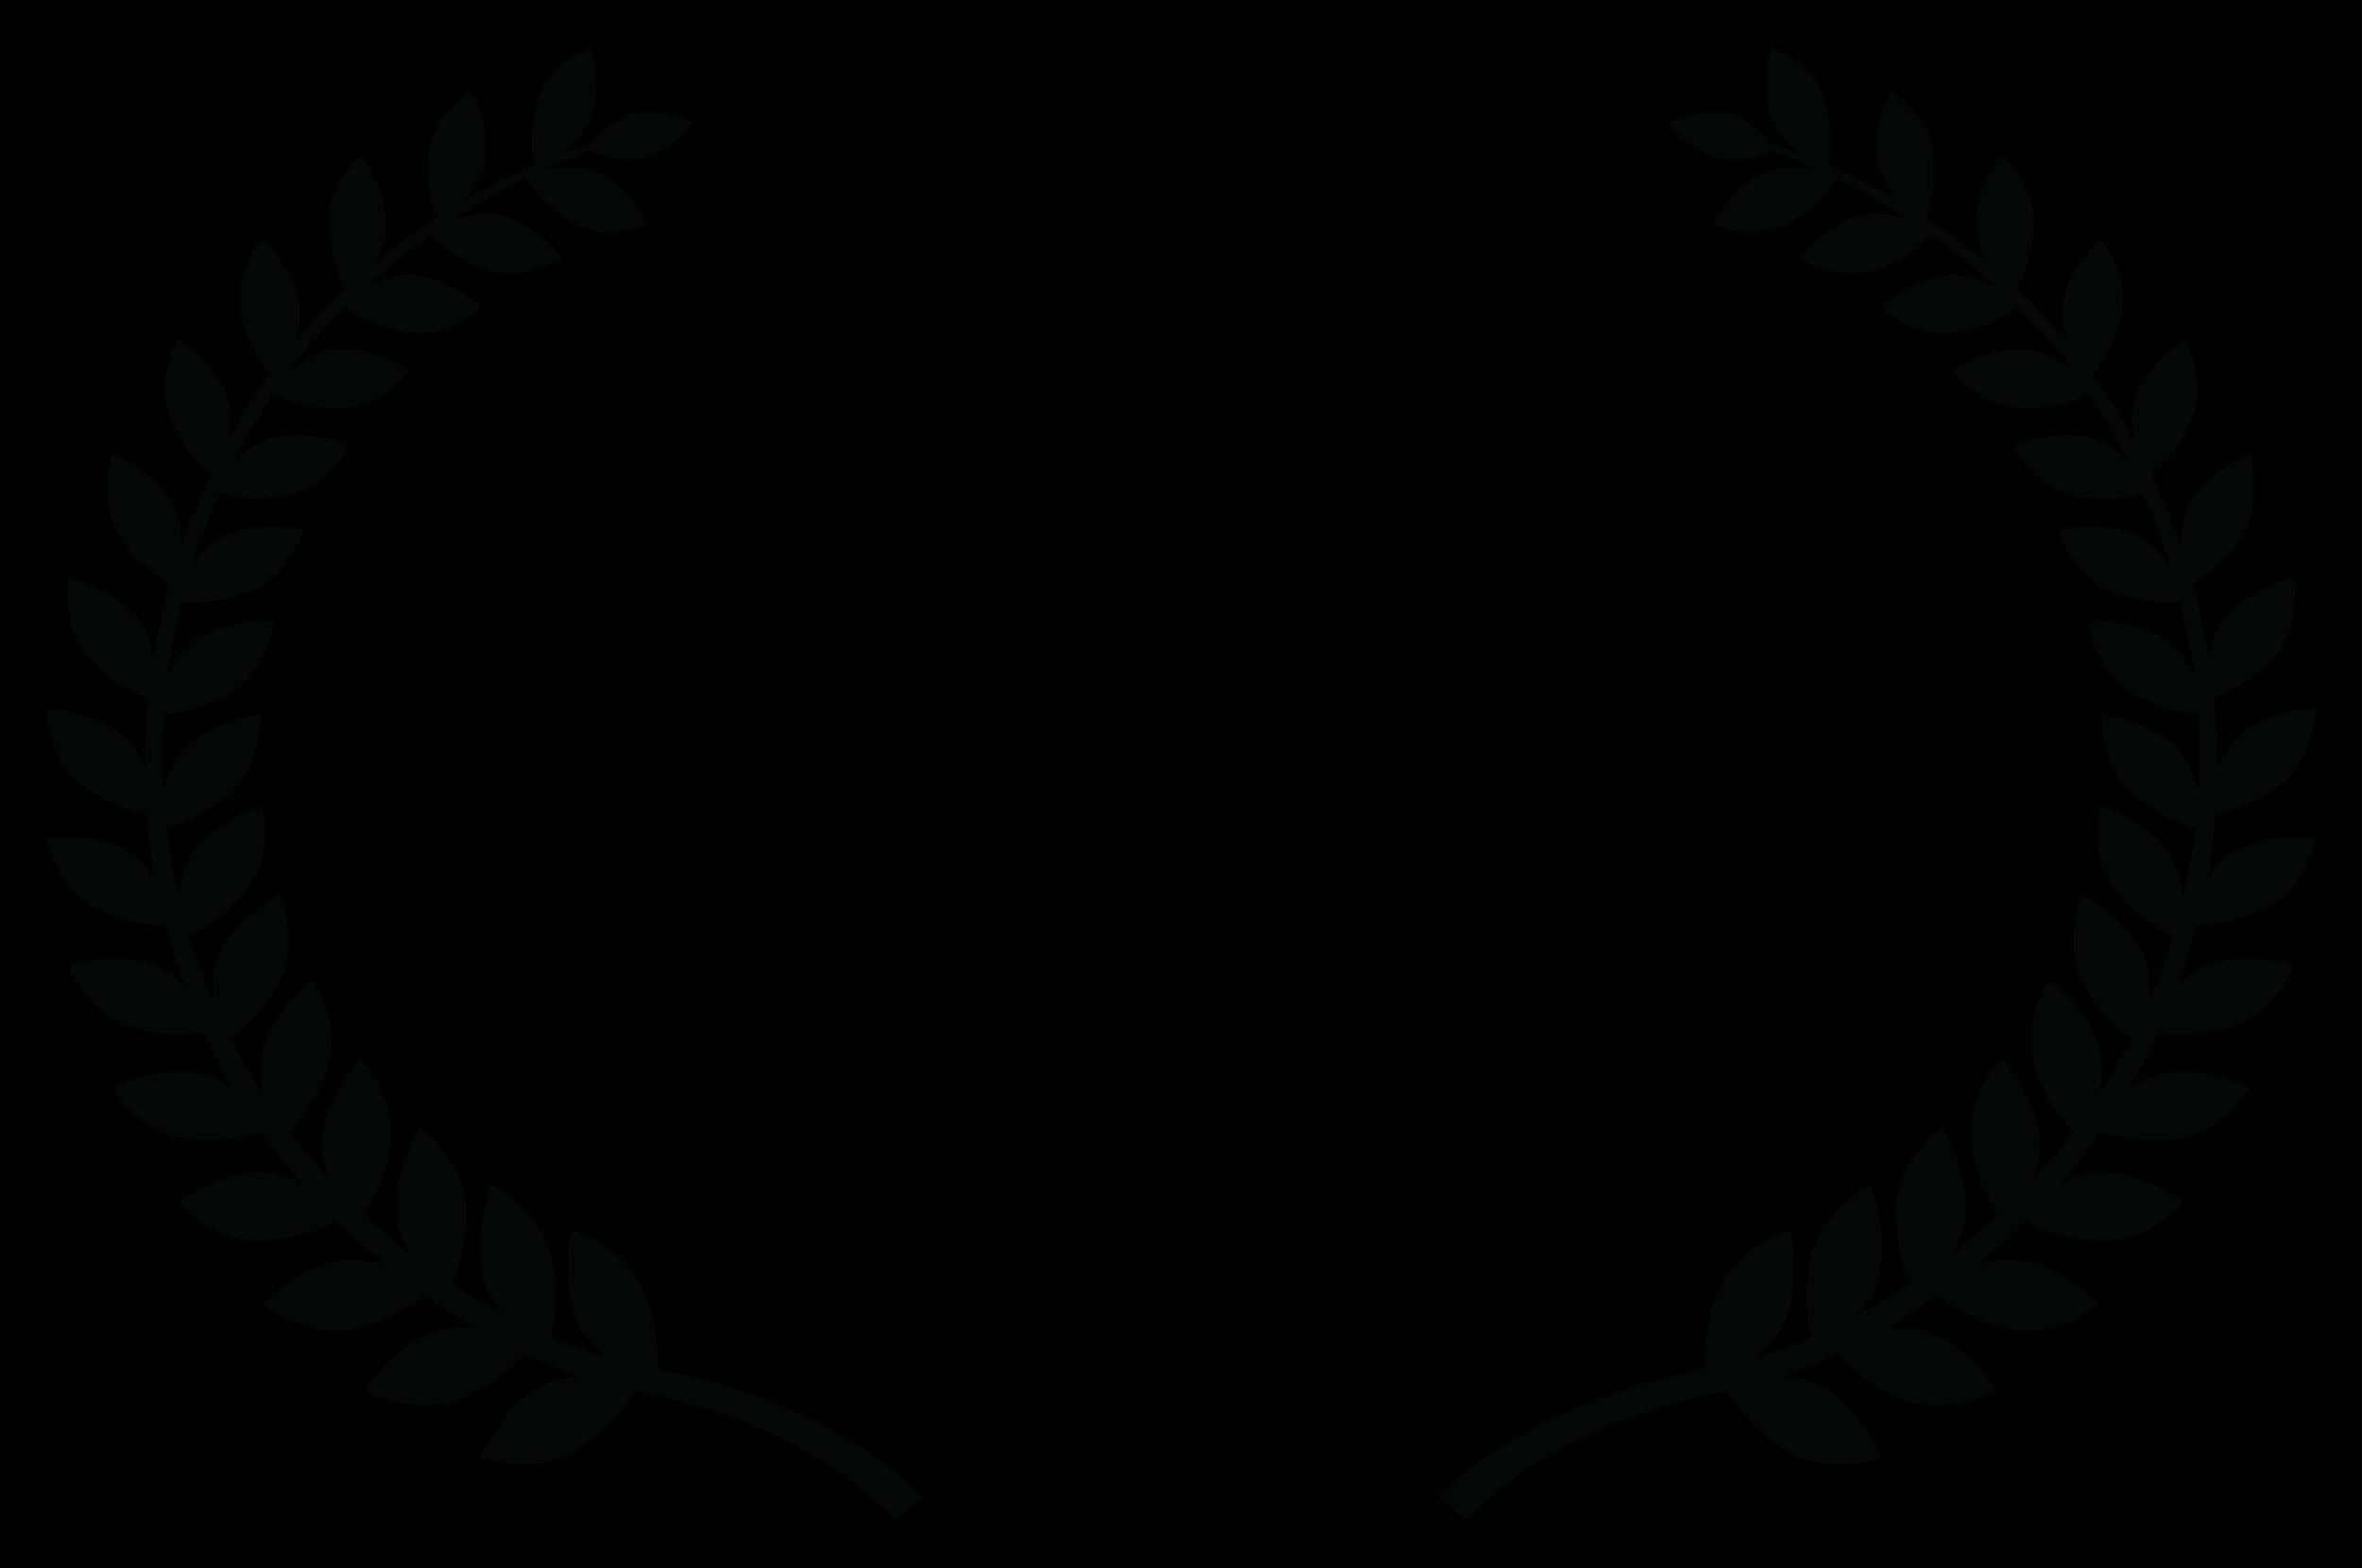 OFFICIALSELECTION-AthensInternationalFilmFestival-2019.png